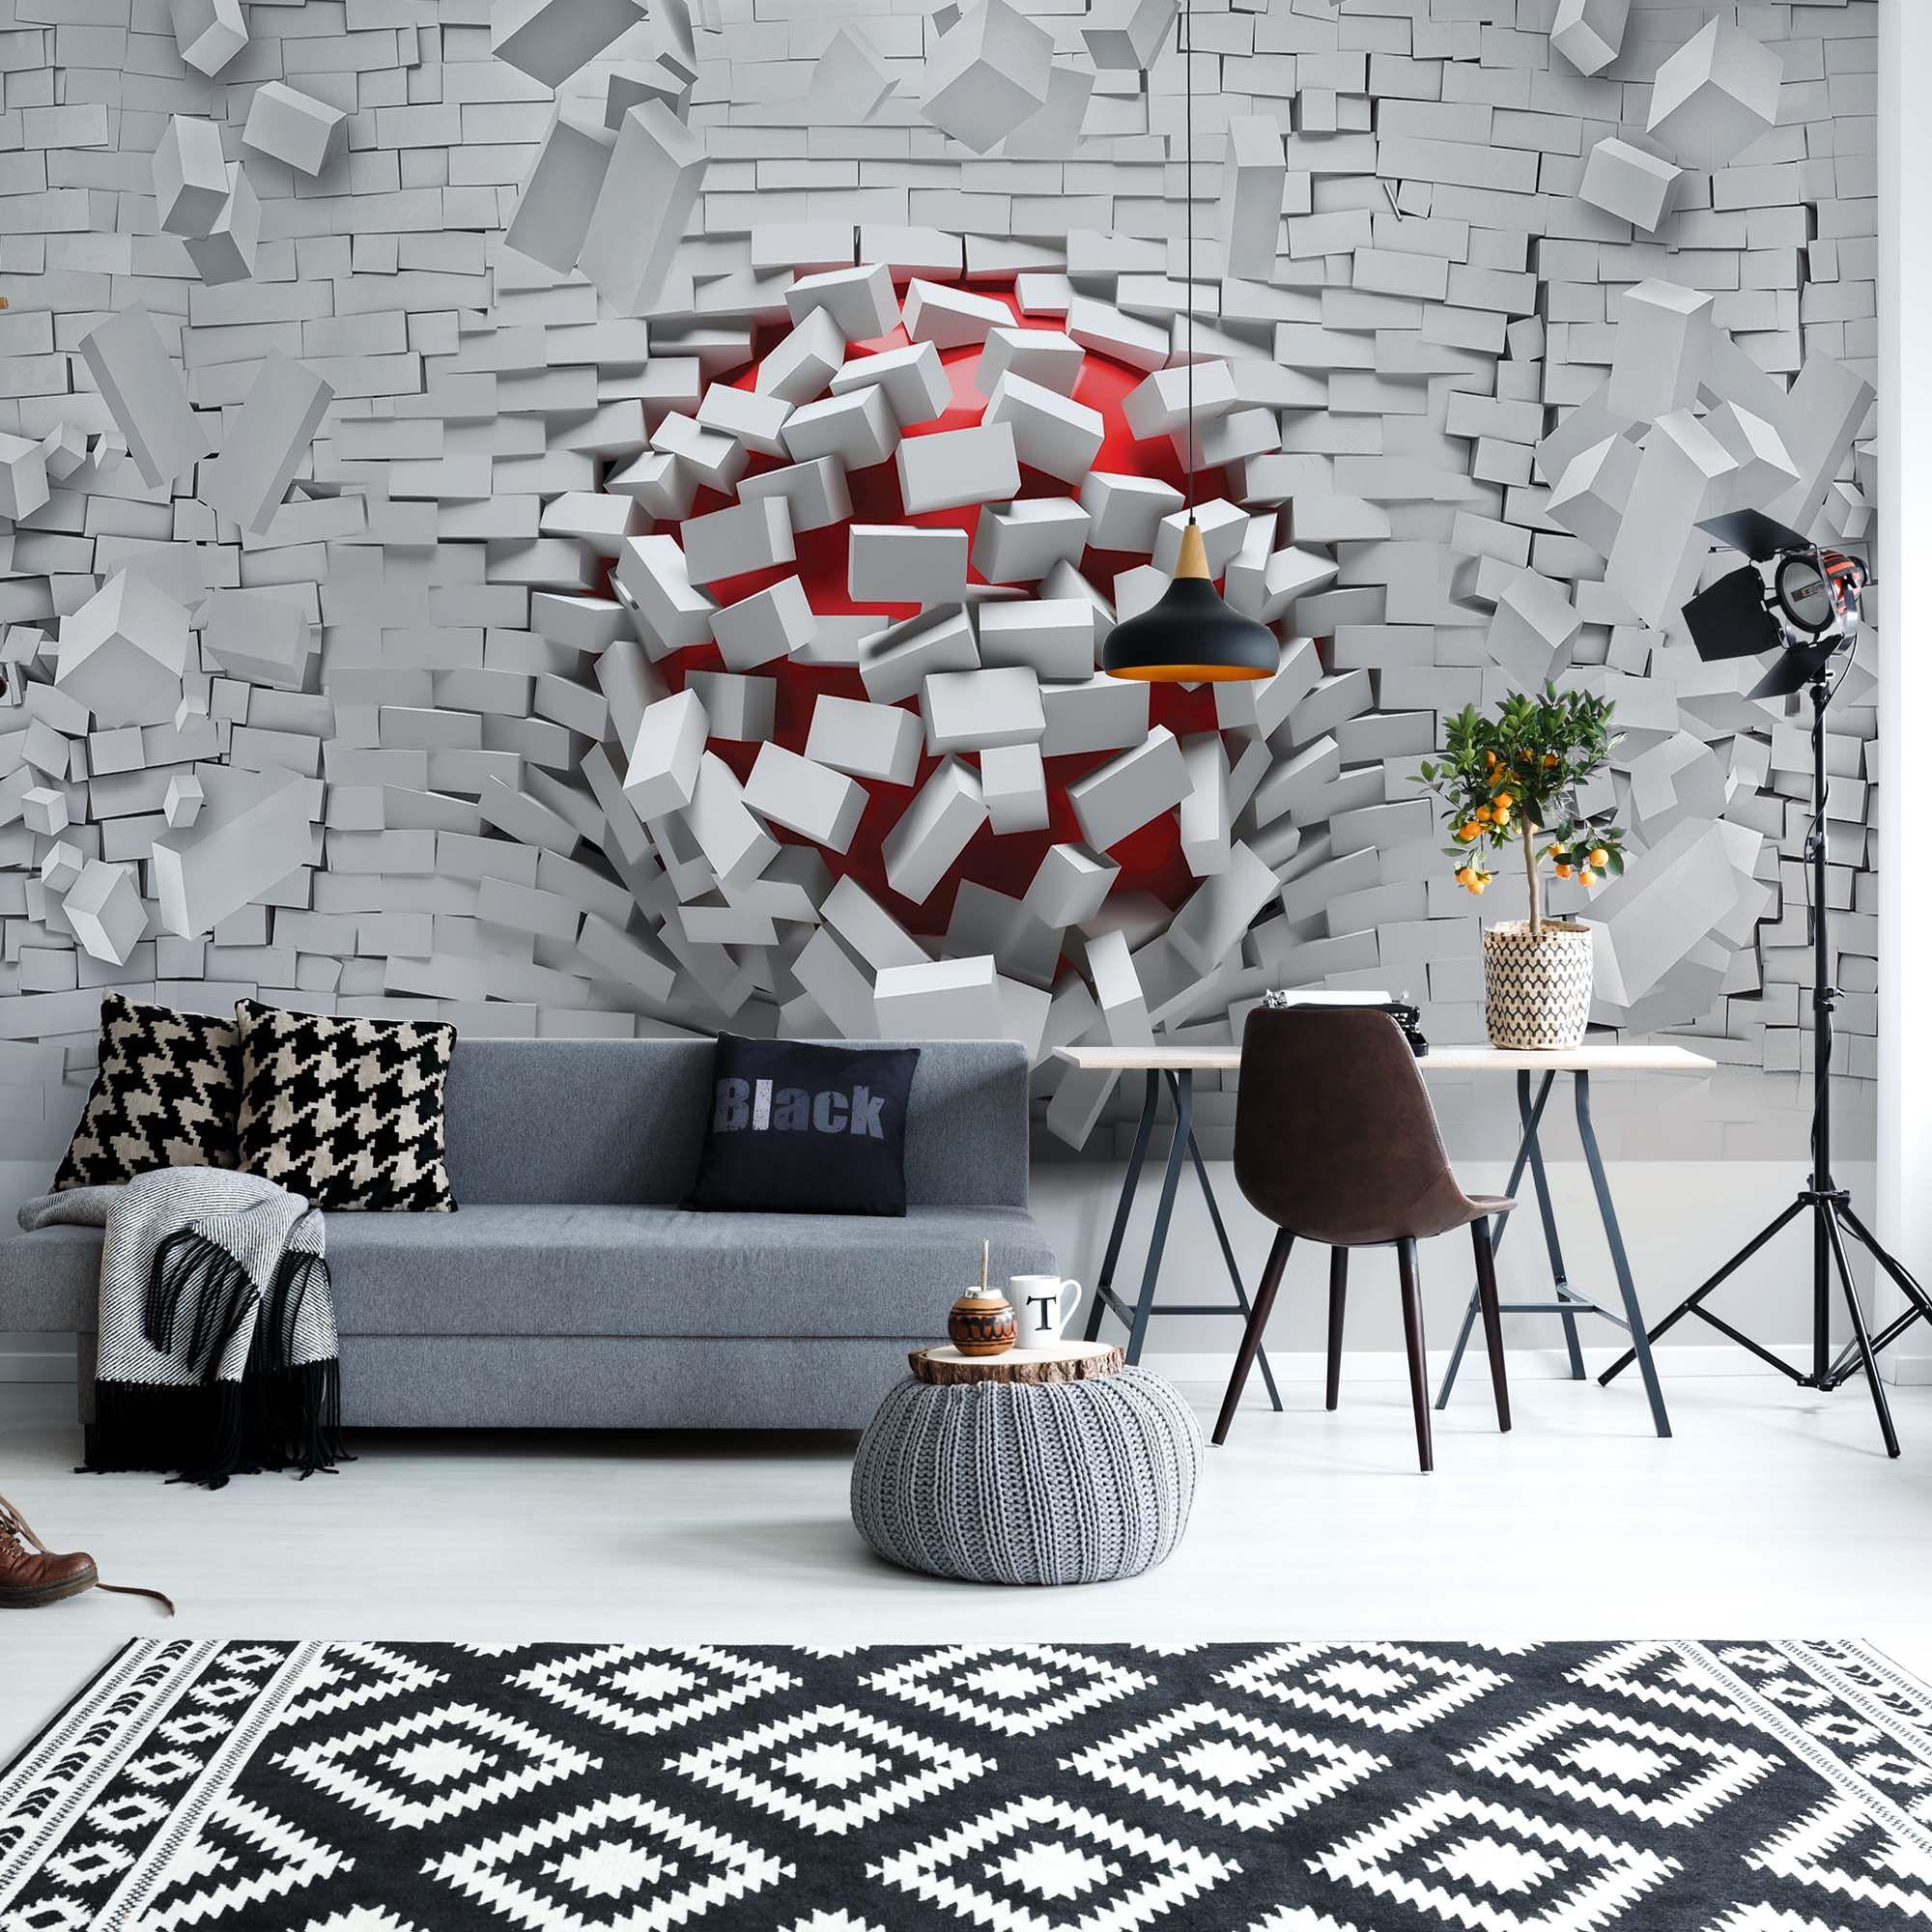 Tapeten Fototapeten Fototapety Tapety Murals Papier Peint Wallpapers 80 In 2020 Wandtapete Wandbild Wand Fototapete